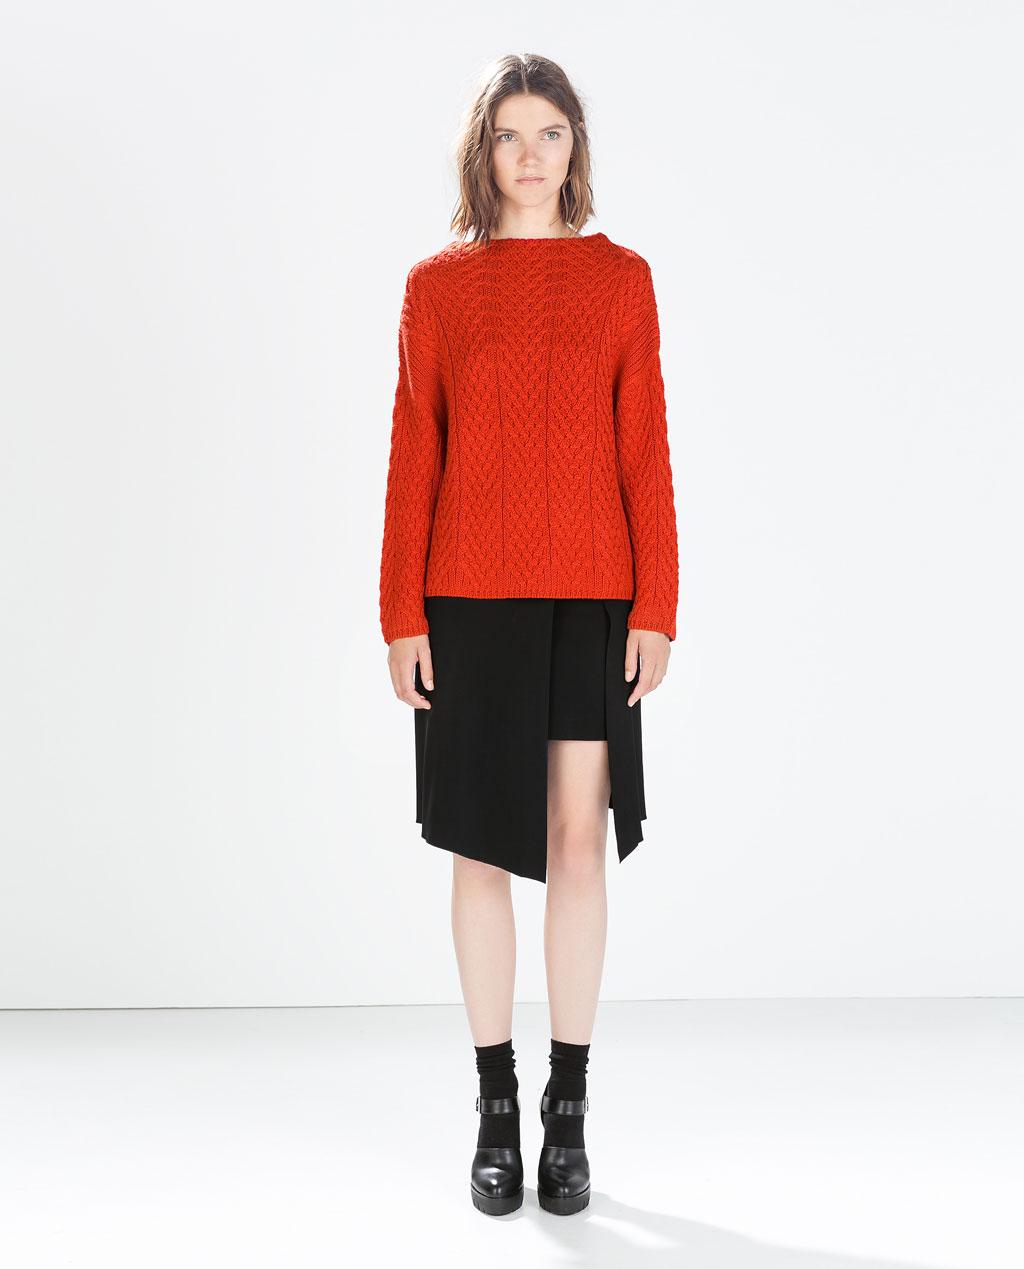 Zara, 299 грн.